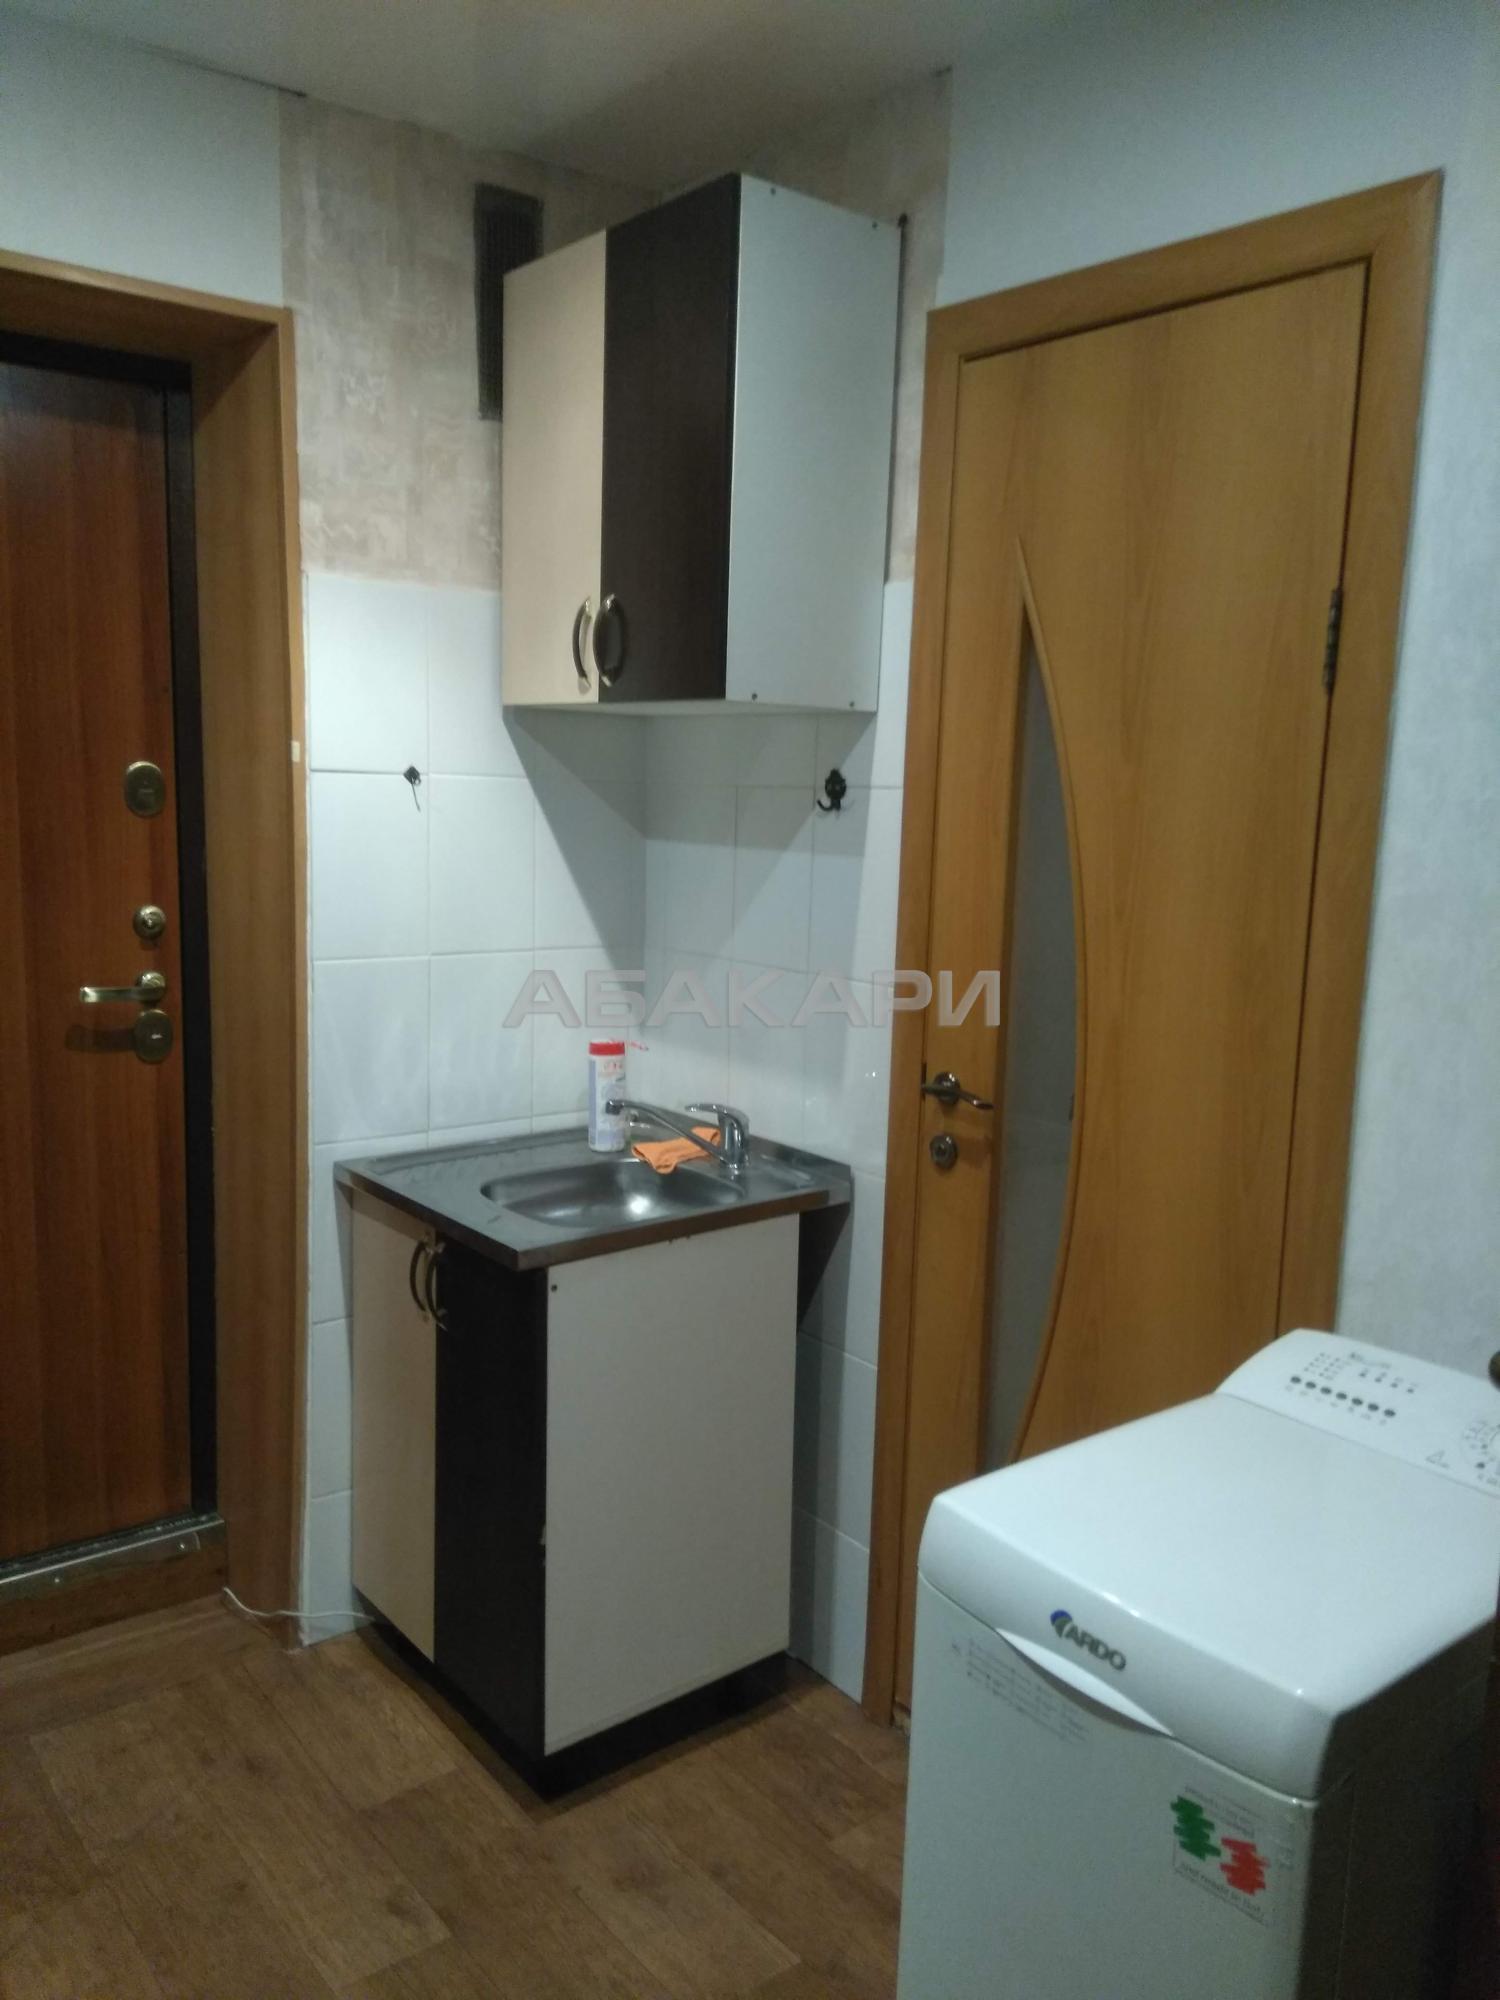 1к квартира улица Курчатова, дом 12 4/5 - 18кв   10000   аренда в Красноярске фото 6